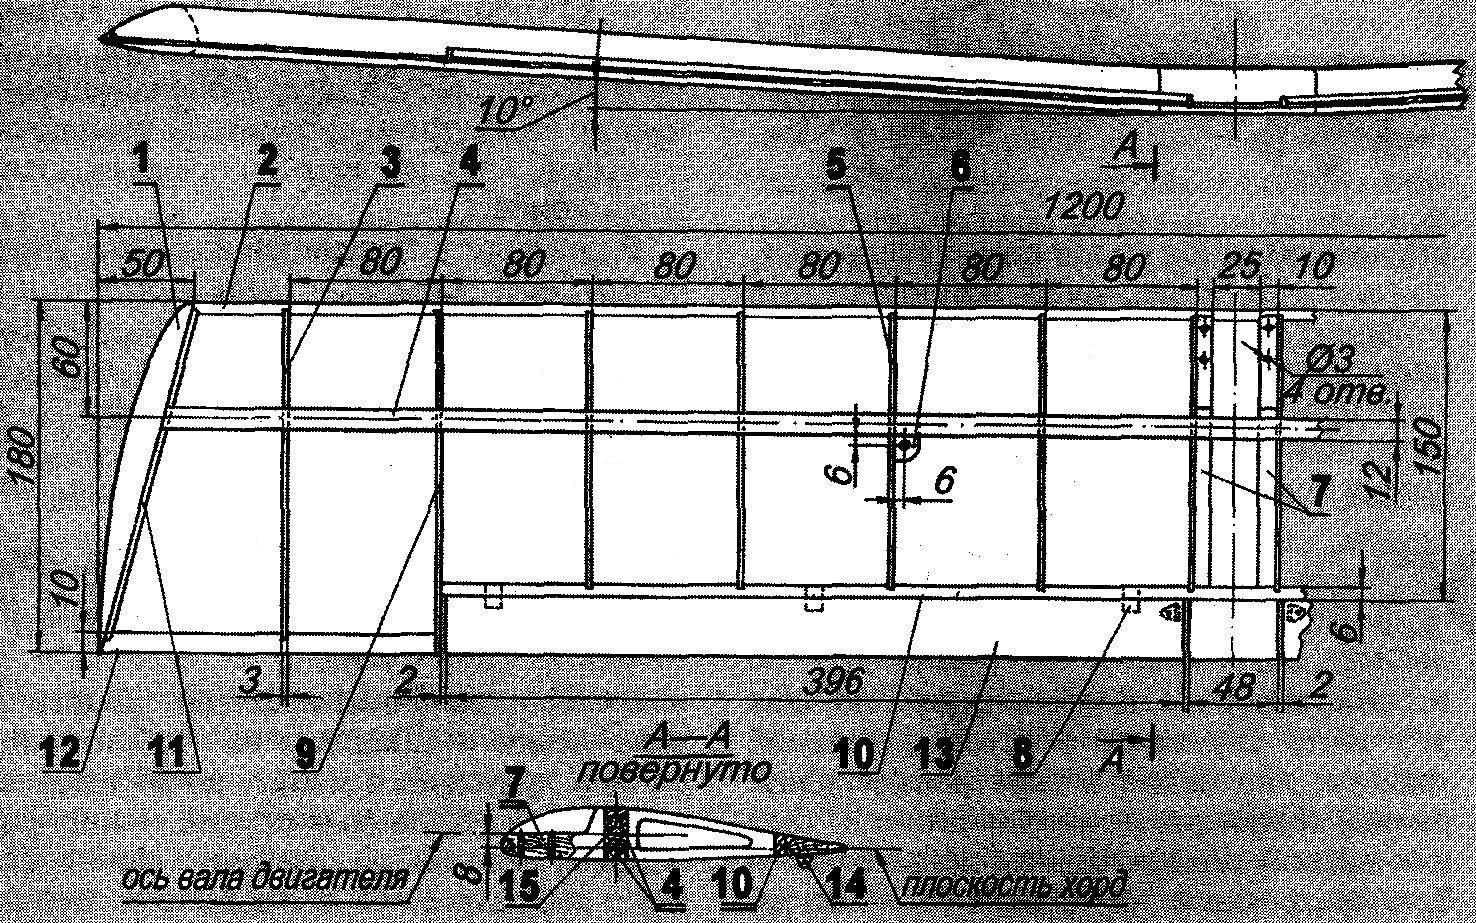 Крыло модели гидросамолета